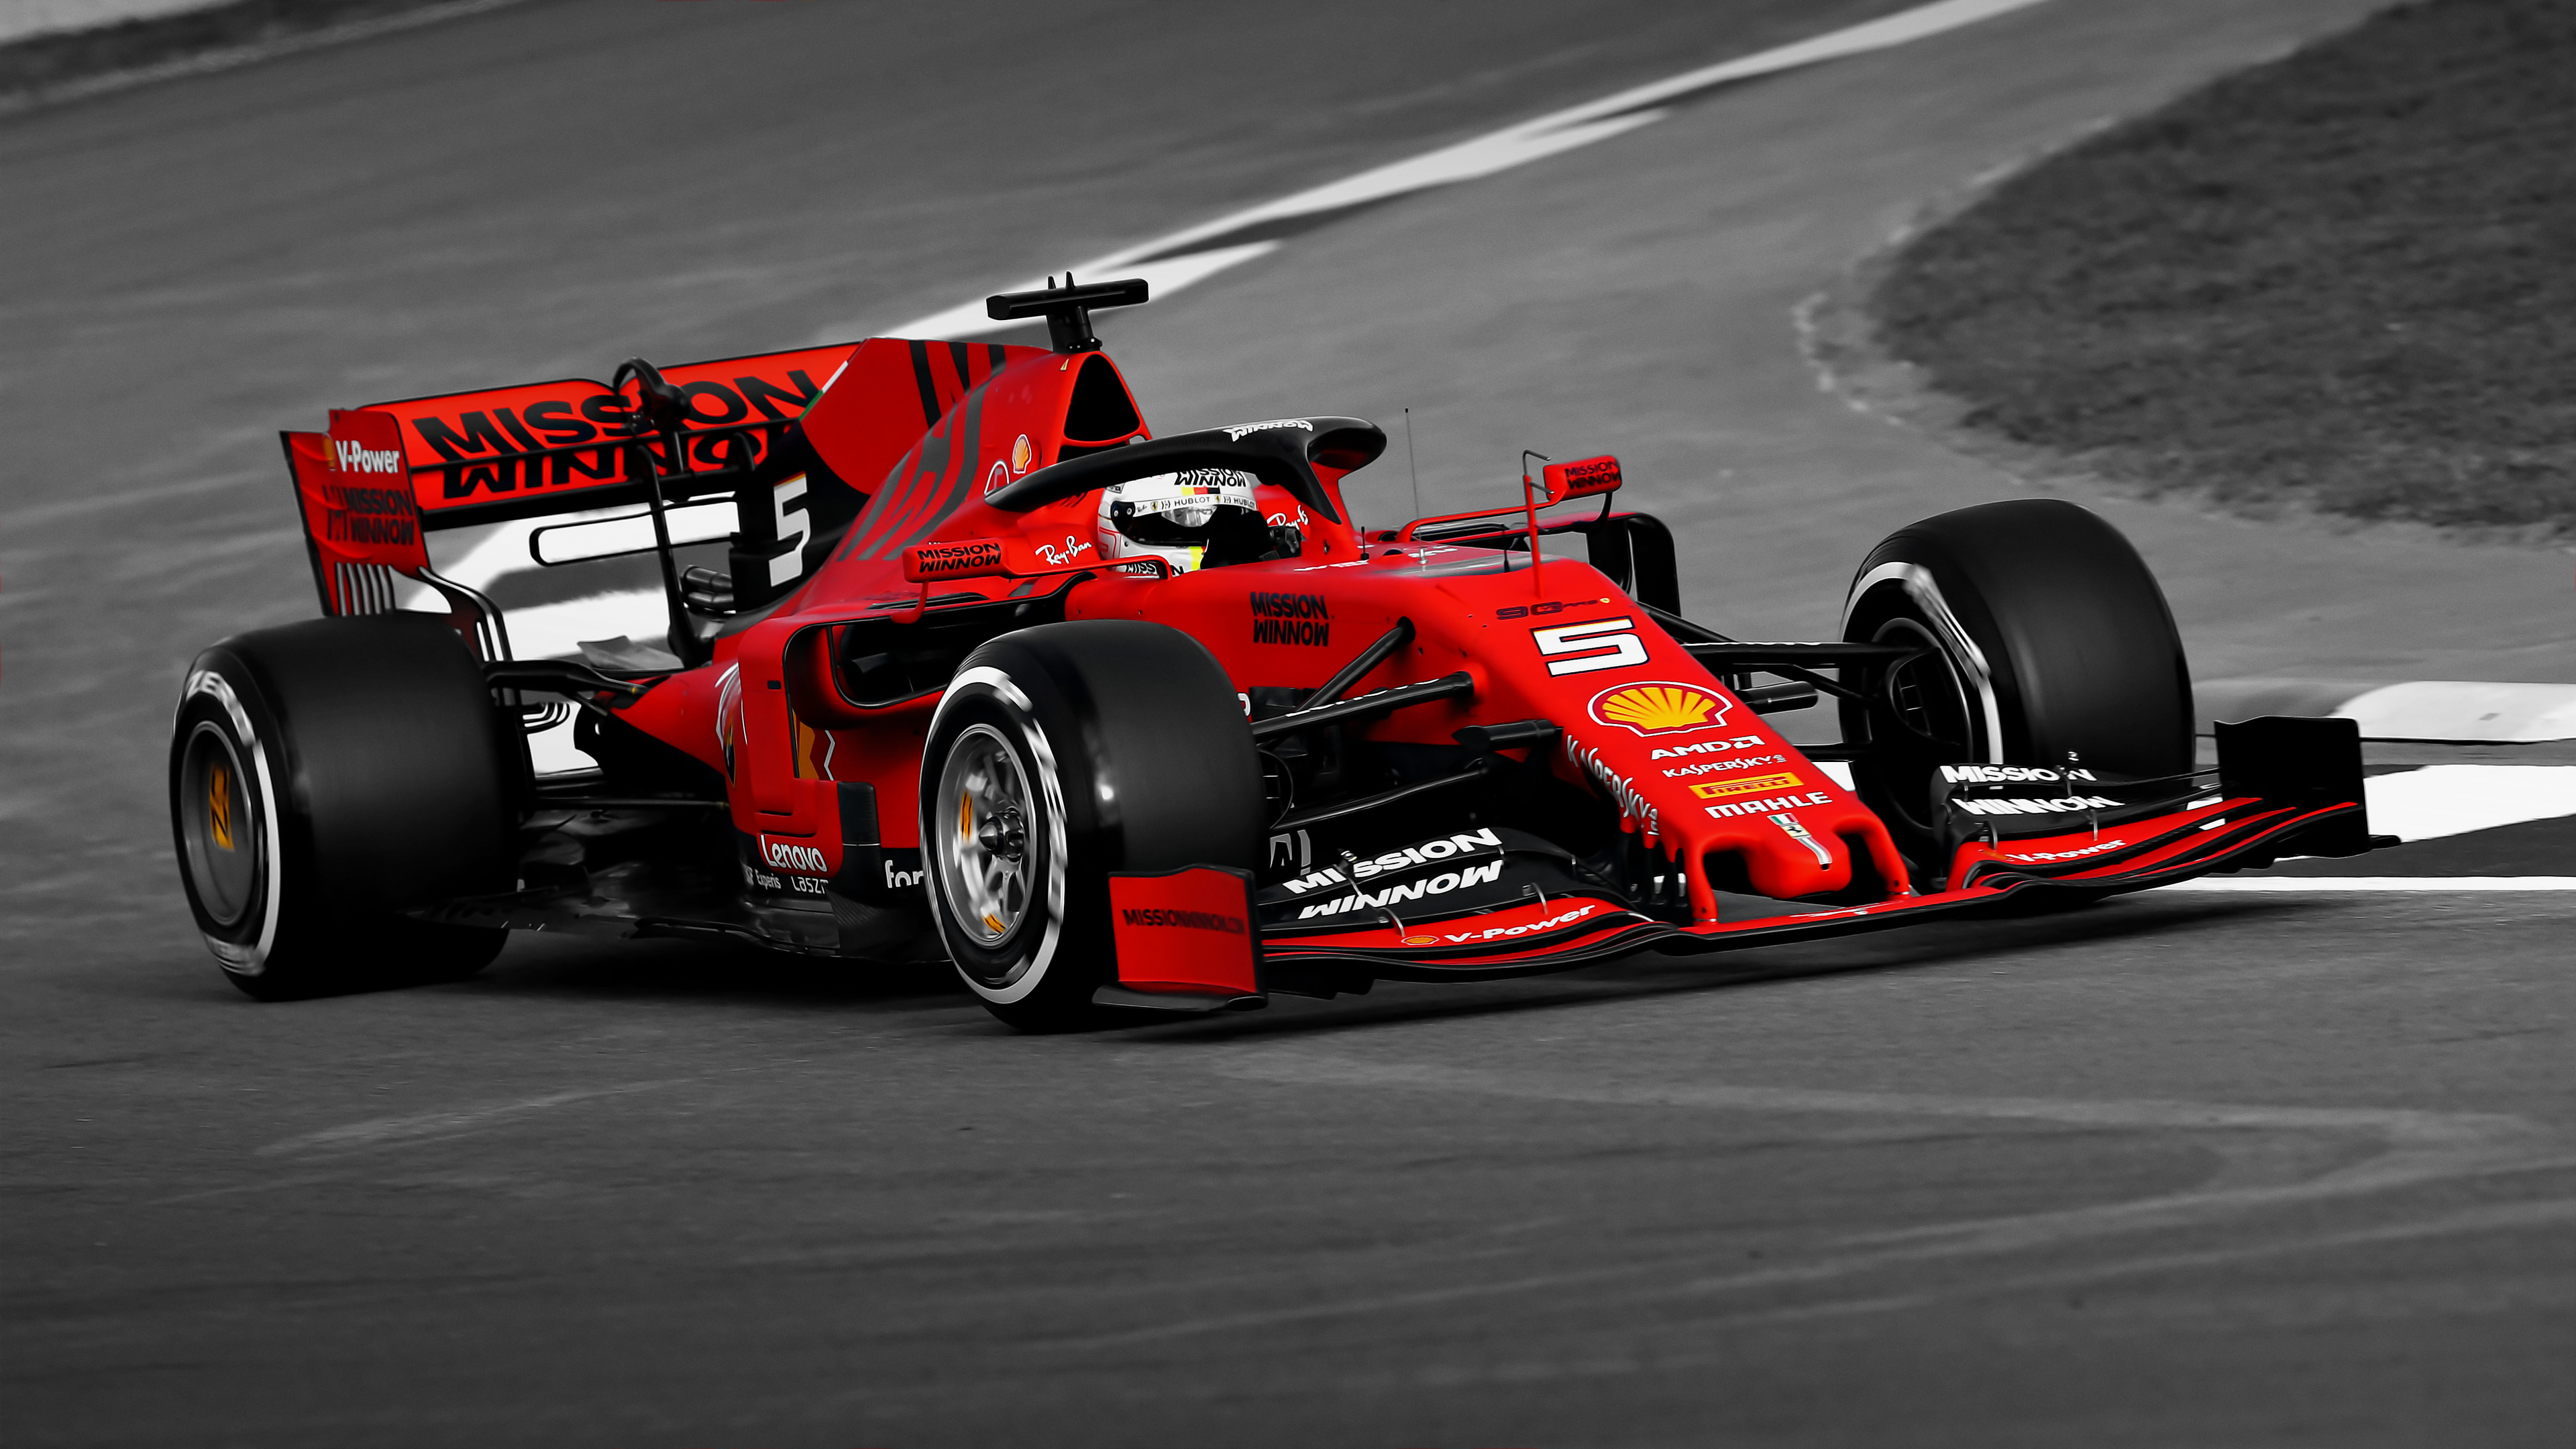 Ferrari Formula 1 Wallpapers Top Free Ferrari Formula 1 Backgrounds Wallpaperaccess